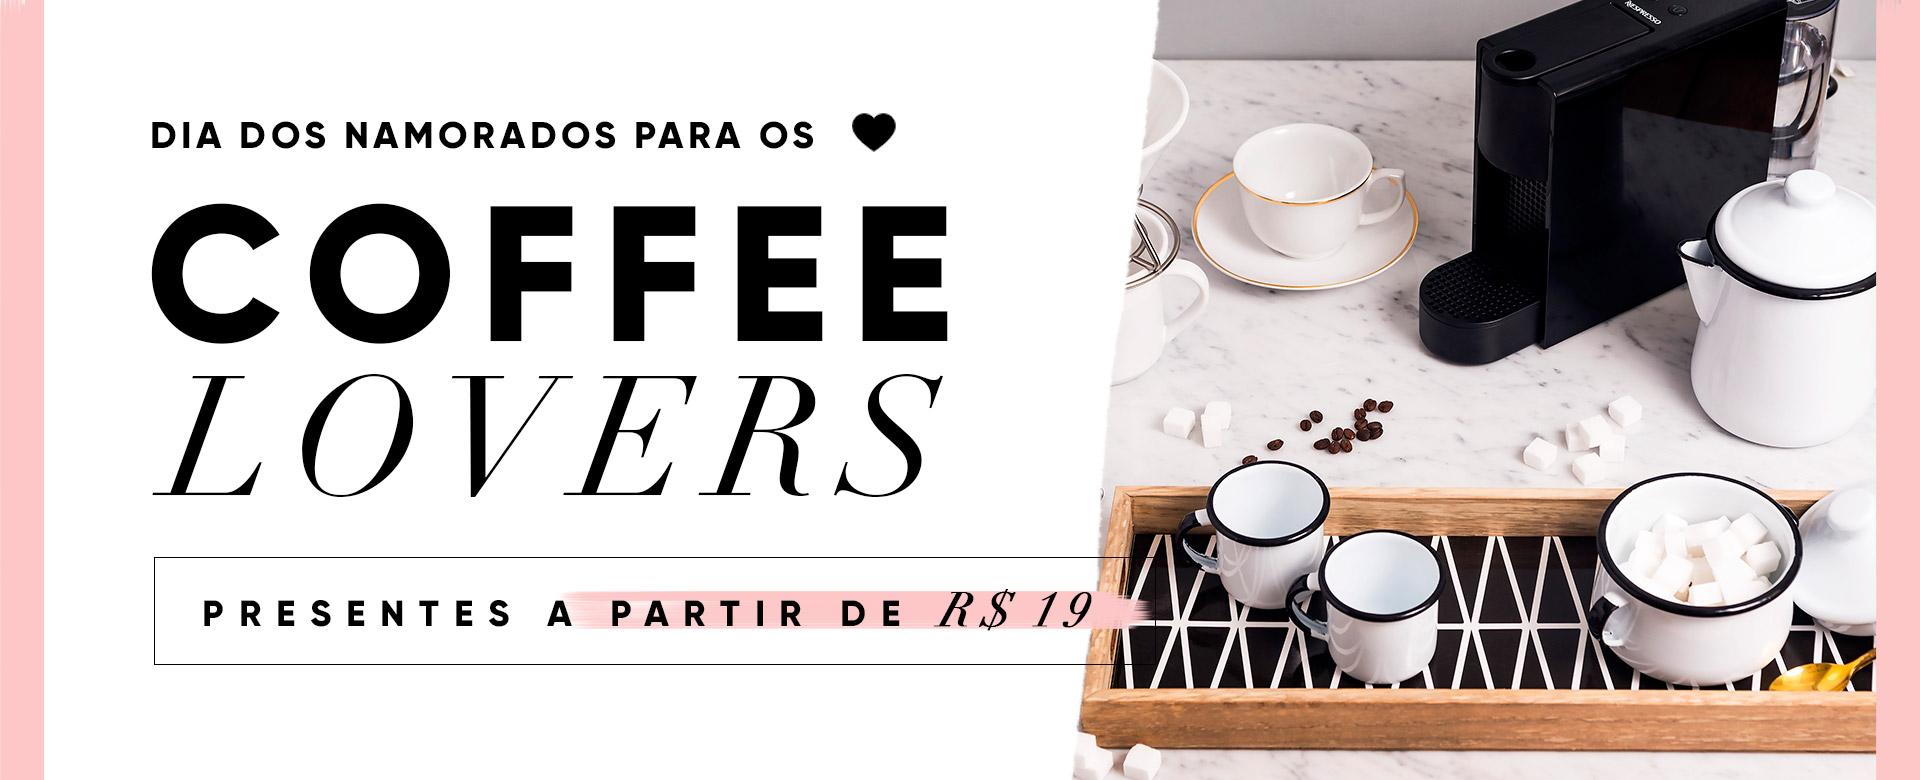 A - NAMORADOS COFFEE LOVERS